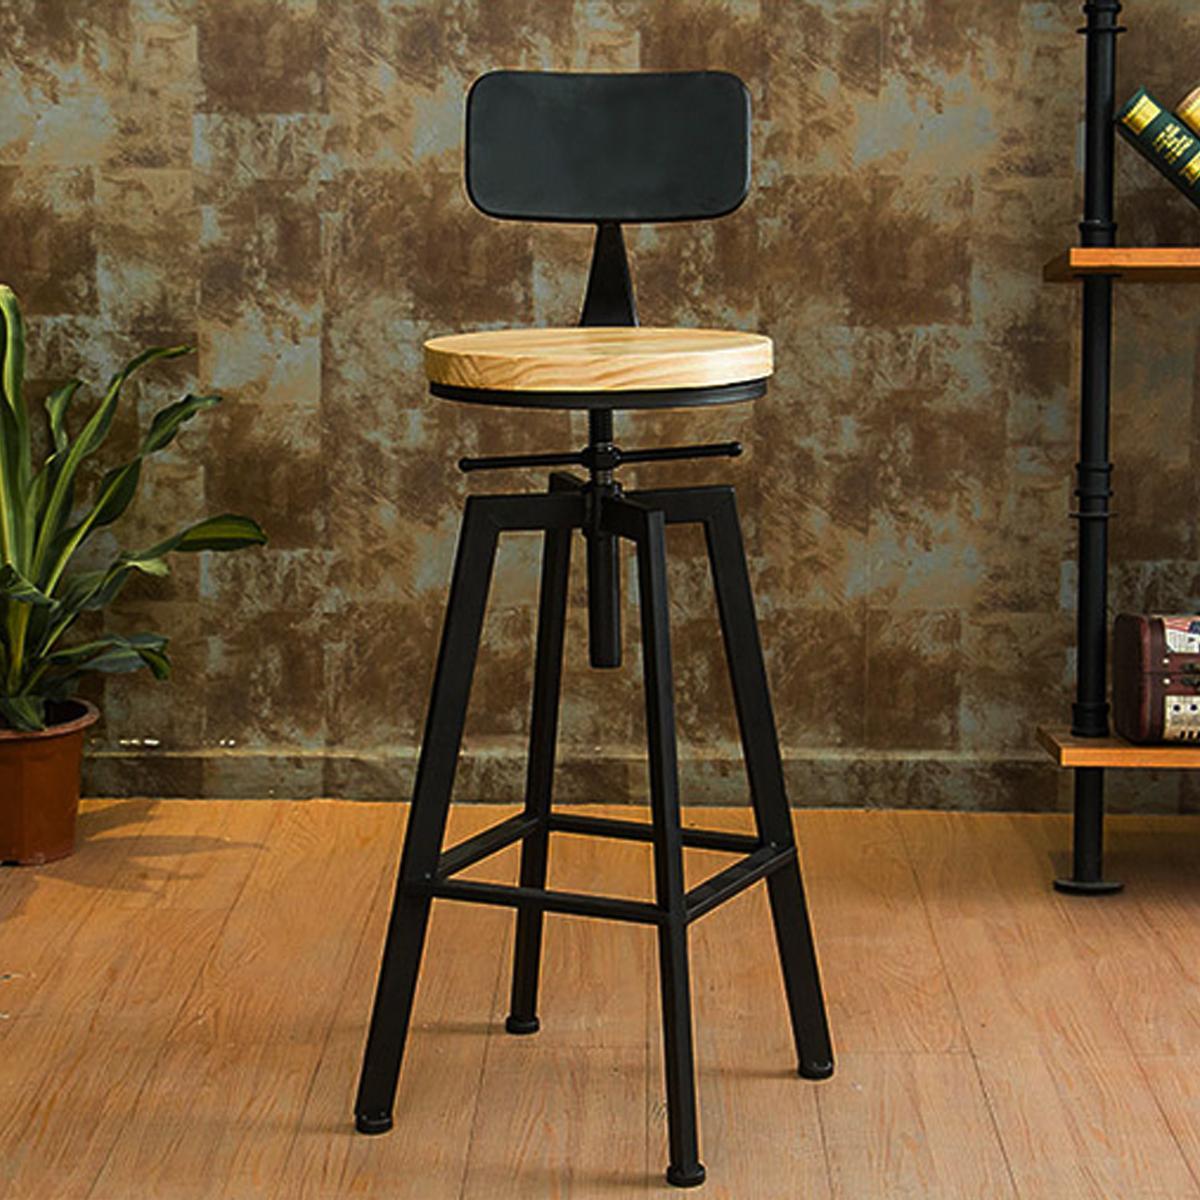 Strange Vintage Retro Rustic Kitchen Metal Breakfast Bar Stool Kitchen Counter Chair Ibusinesslaw Wood Chair Design Ideas Ibusinesslaworg